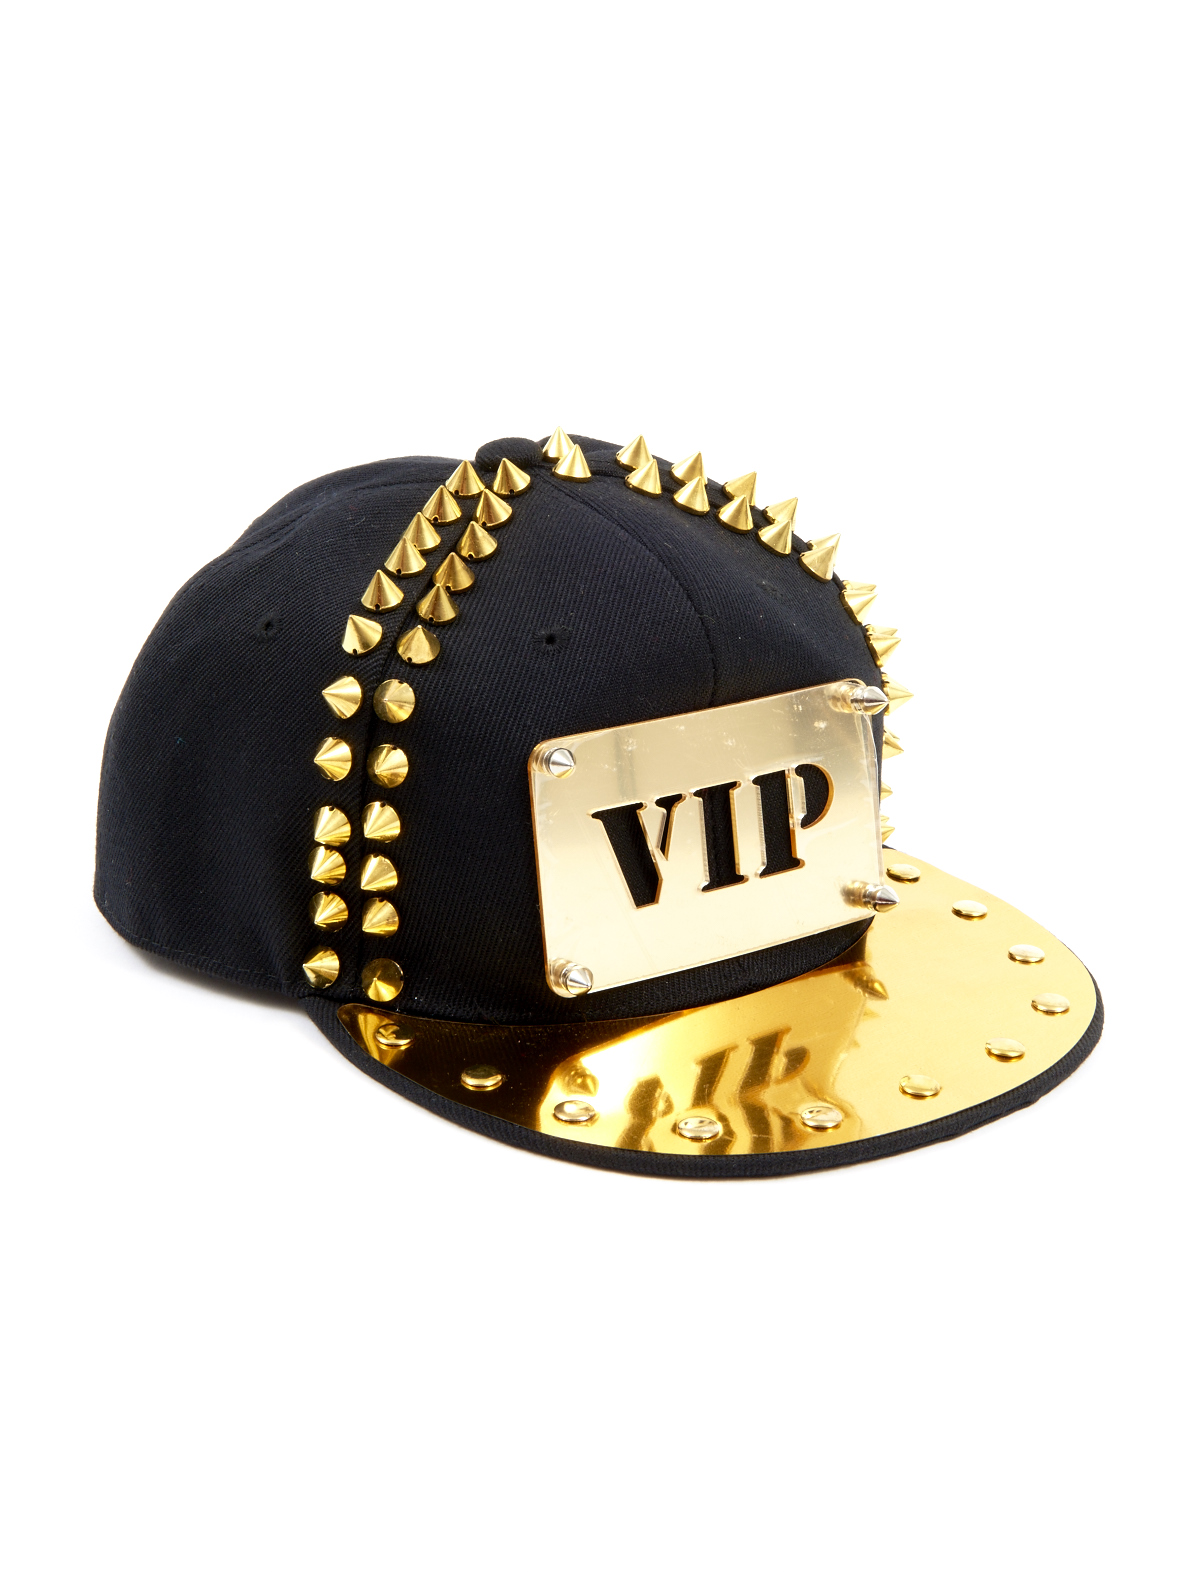 Base Cup VIP